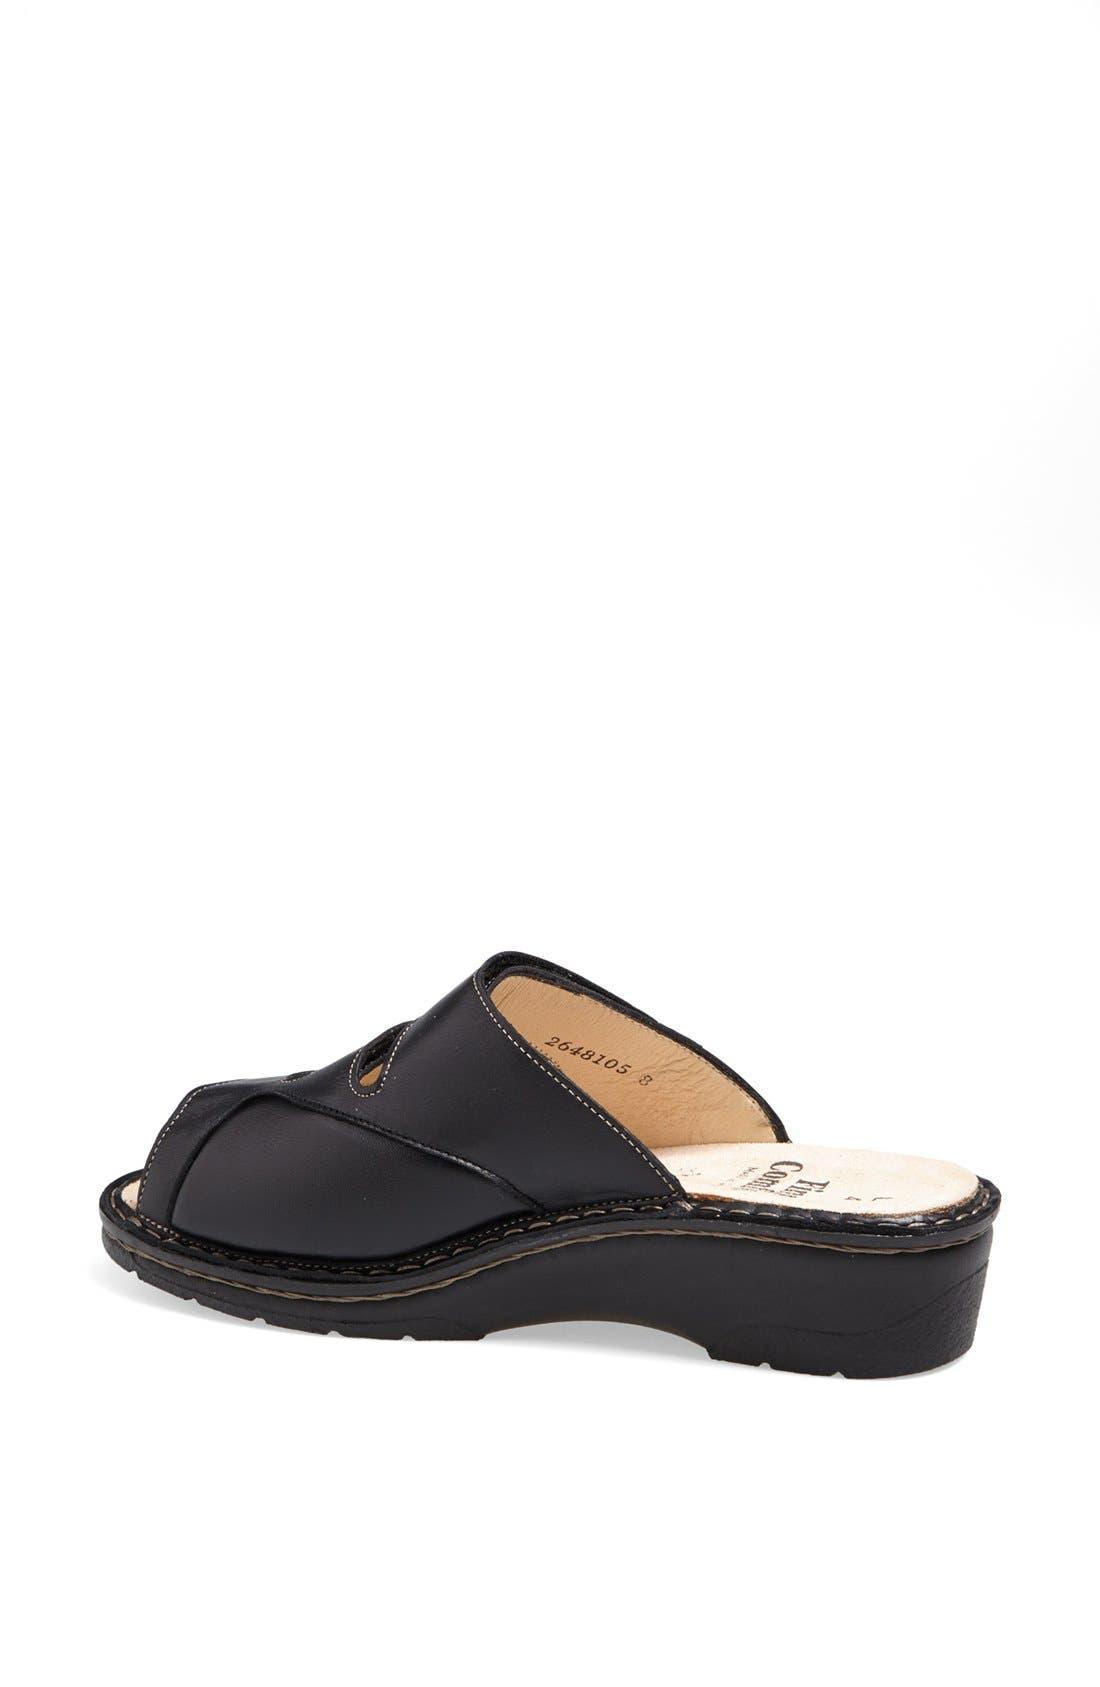 'Tilburg' Leather Sandal,                             Alternate thumbnail 2, color,                             Black